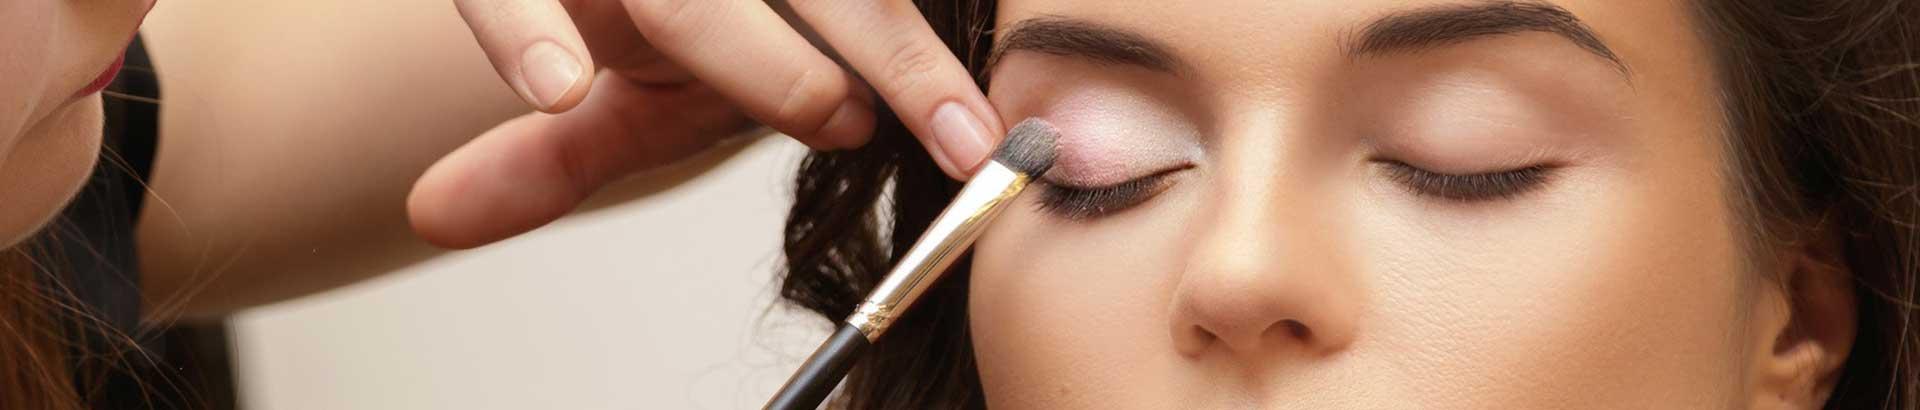 maquillage pro yvrac